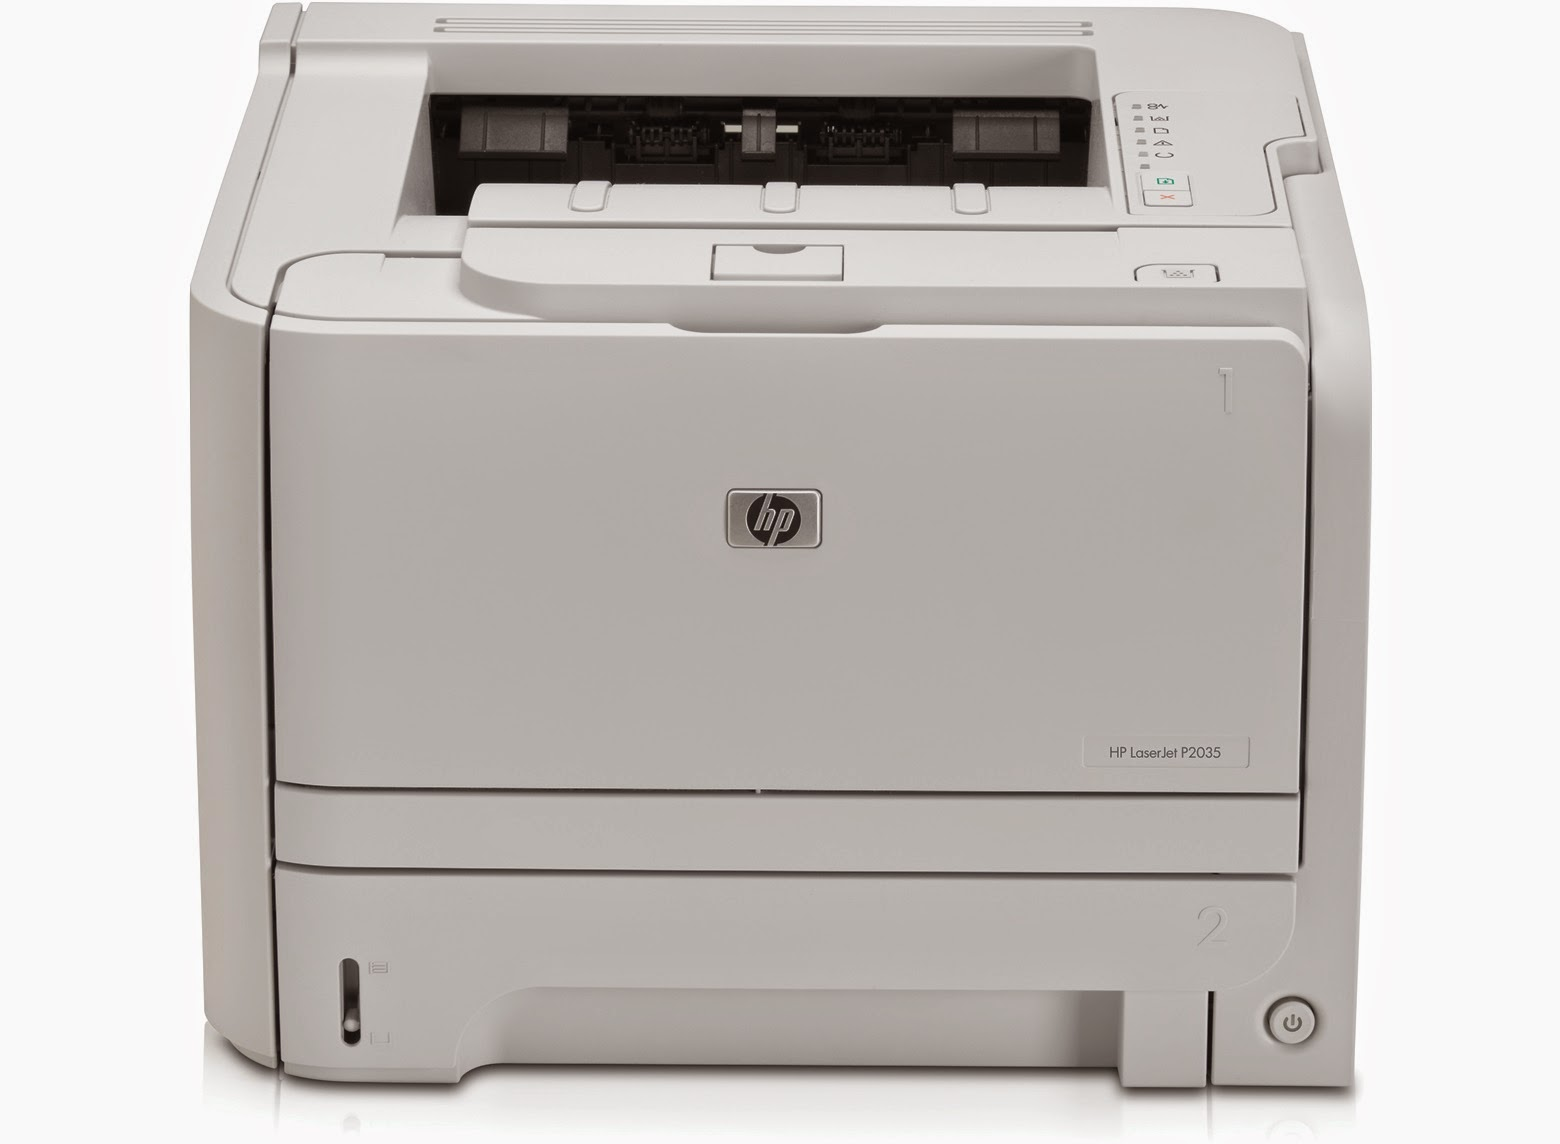 HP LaserJet P2035 Printer series Software and Driver ...